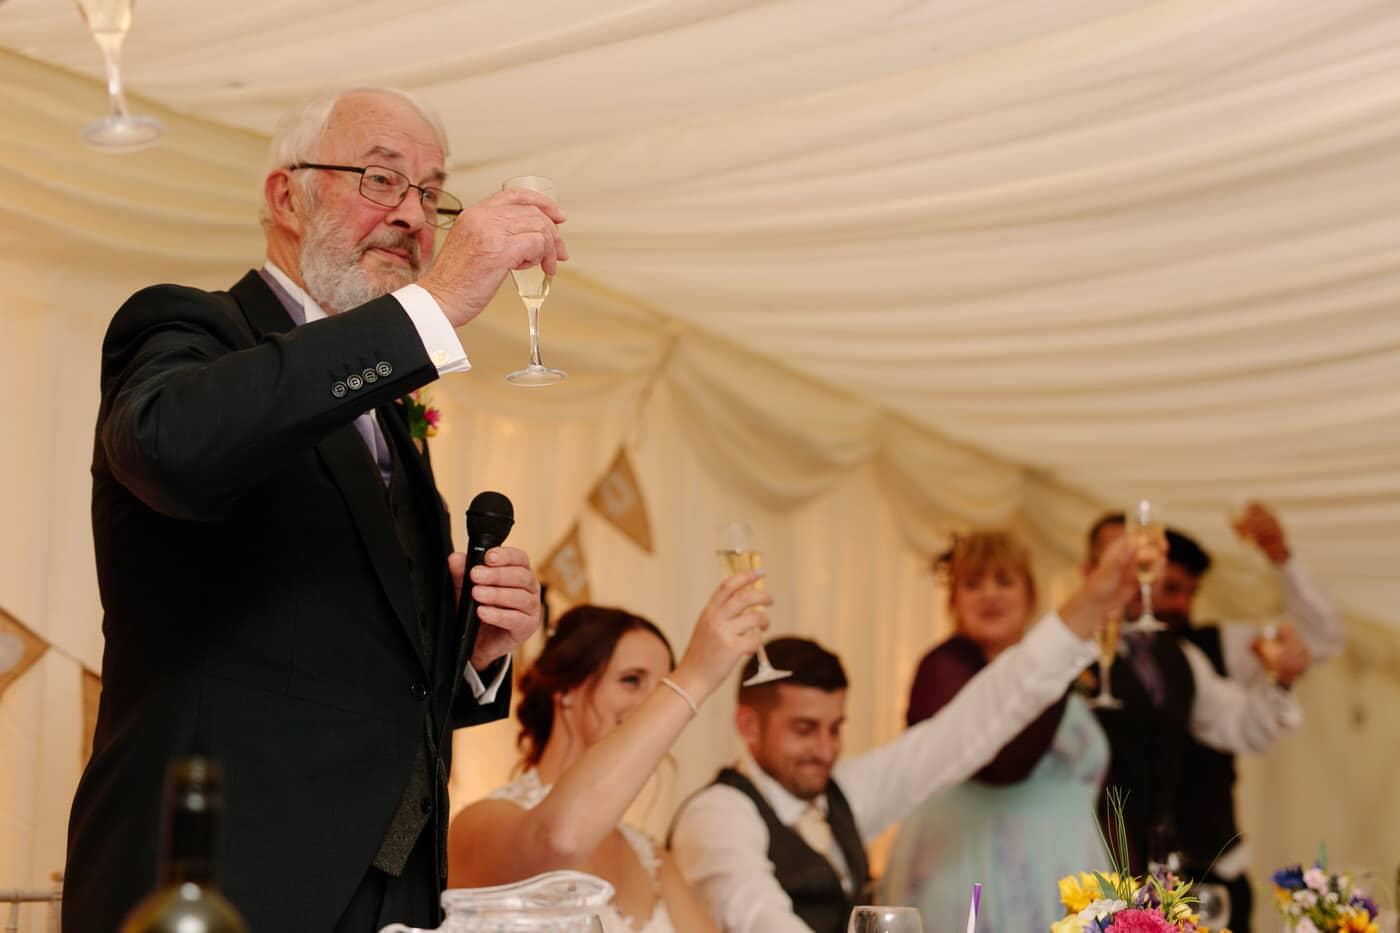 AA PENTREMAWRNORTH WALES WEDDING 2210